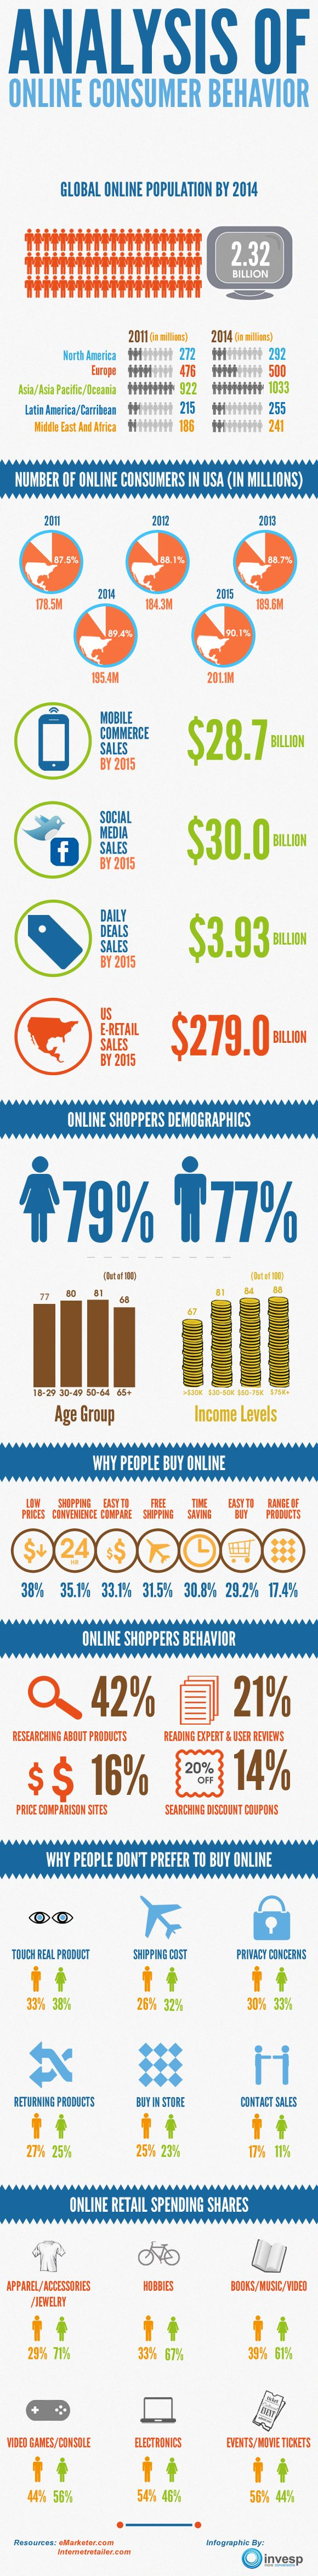 Analysis of online consumer behaviour (Invesp / eMarketer 2012)